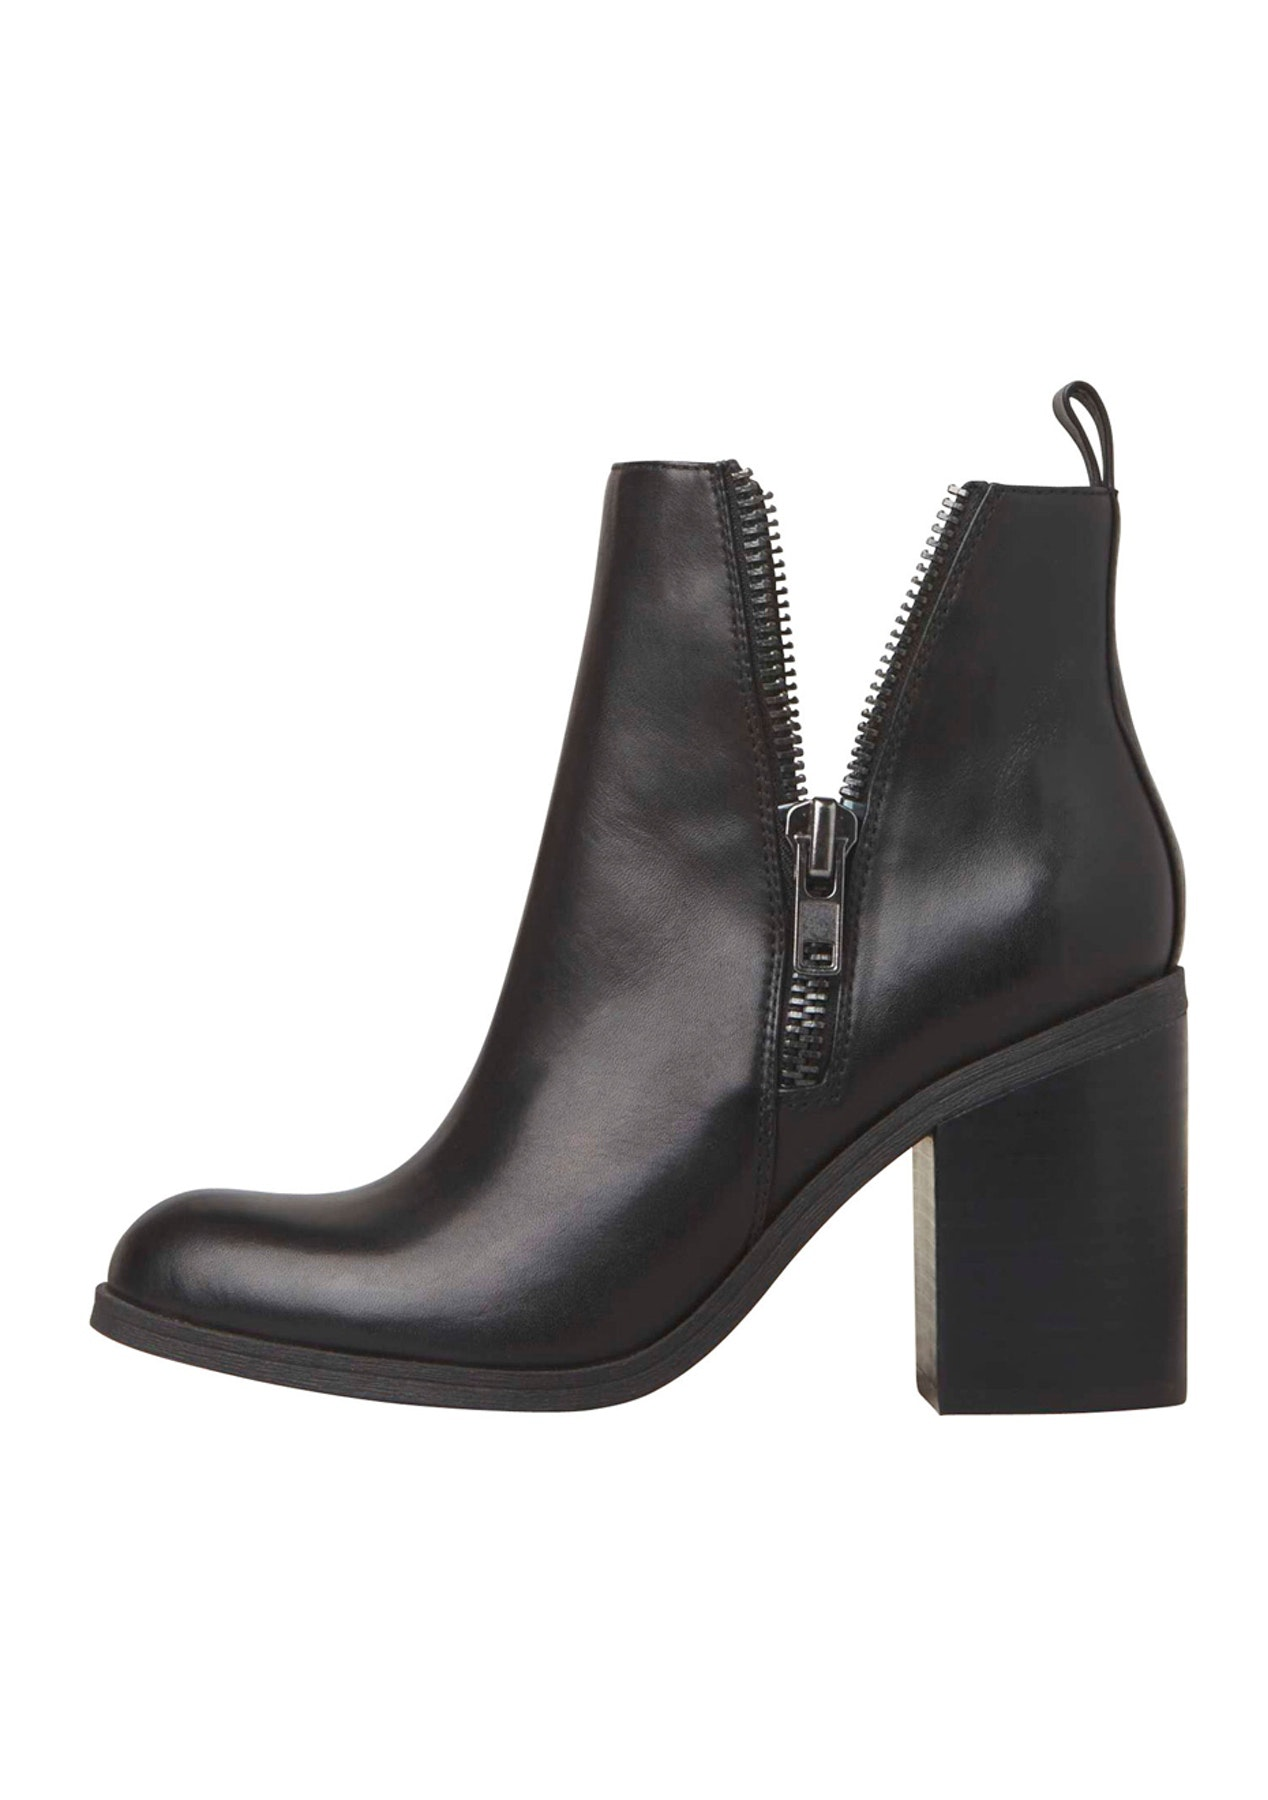 Windsor Smith - Brew - Black Leather